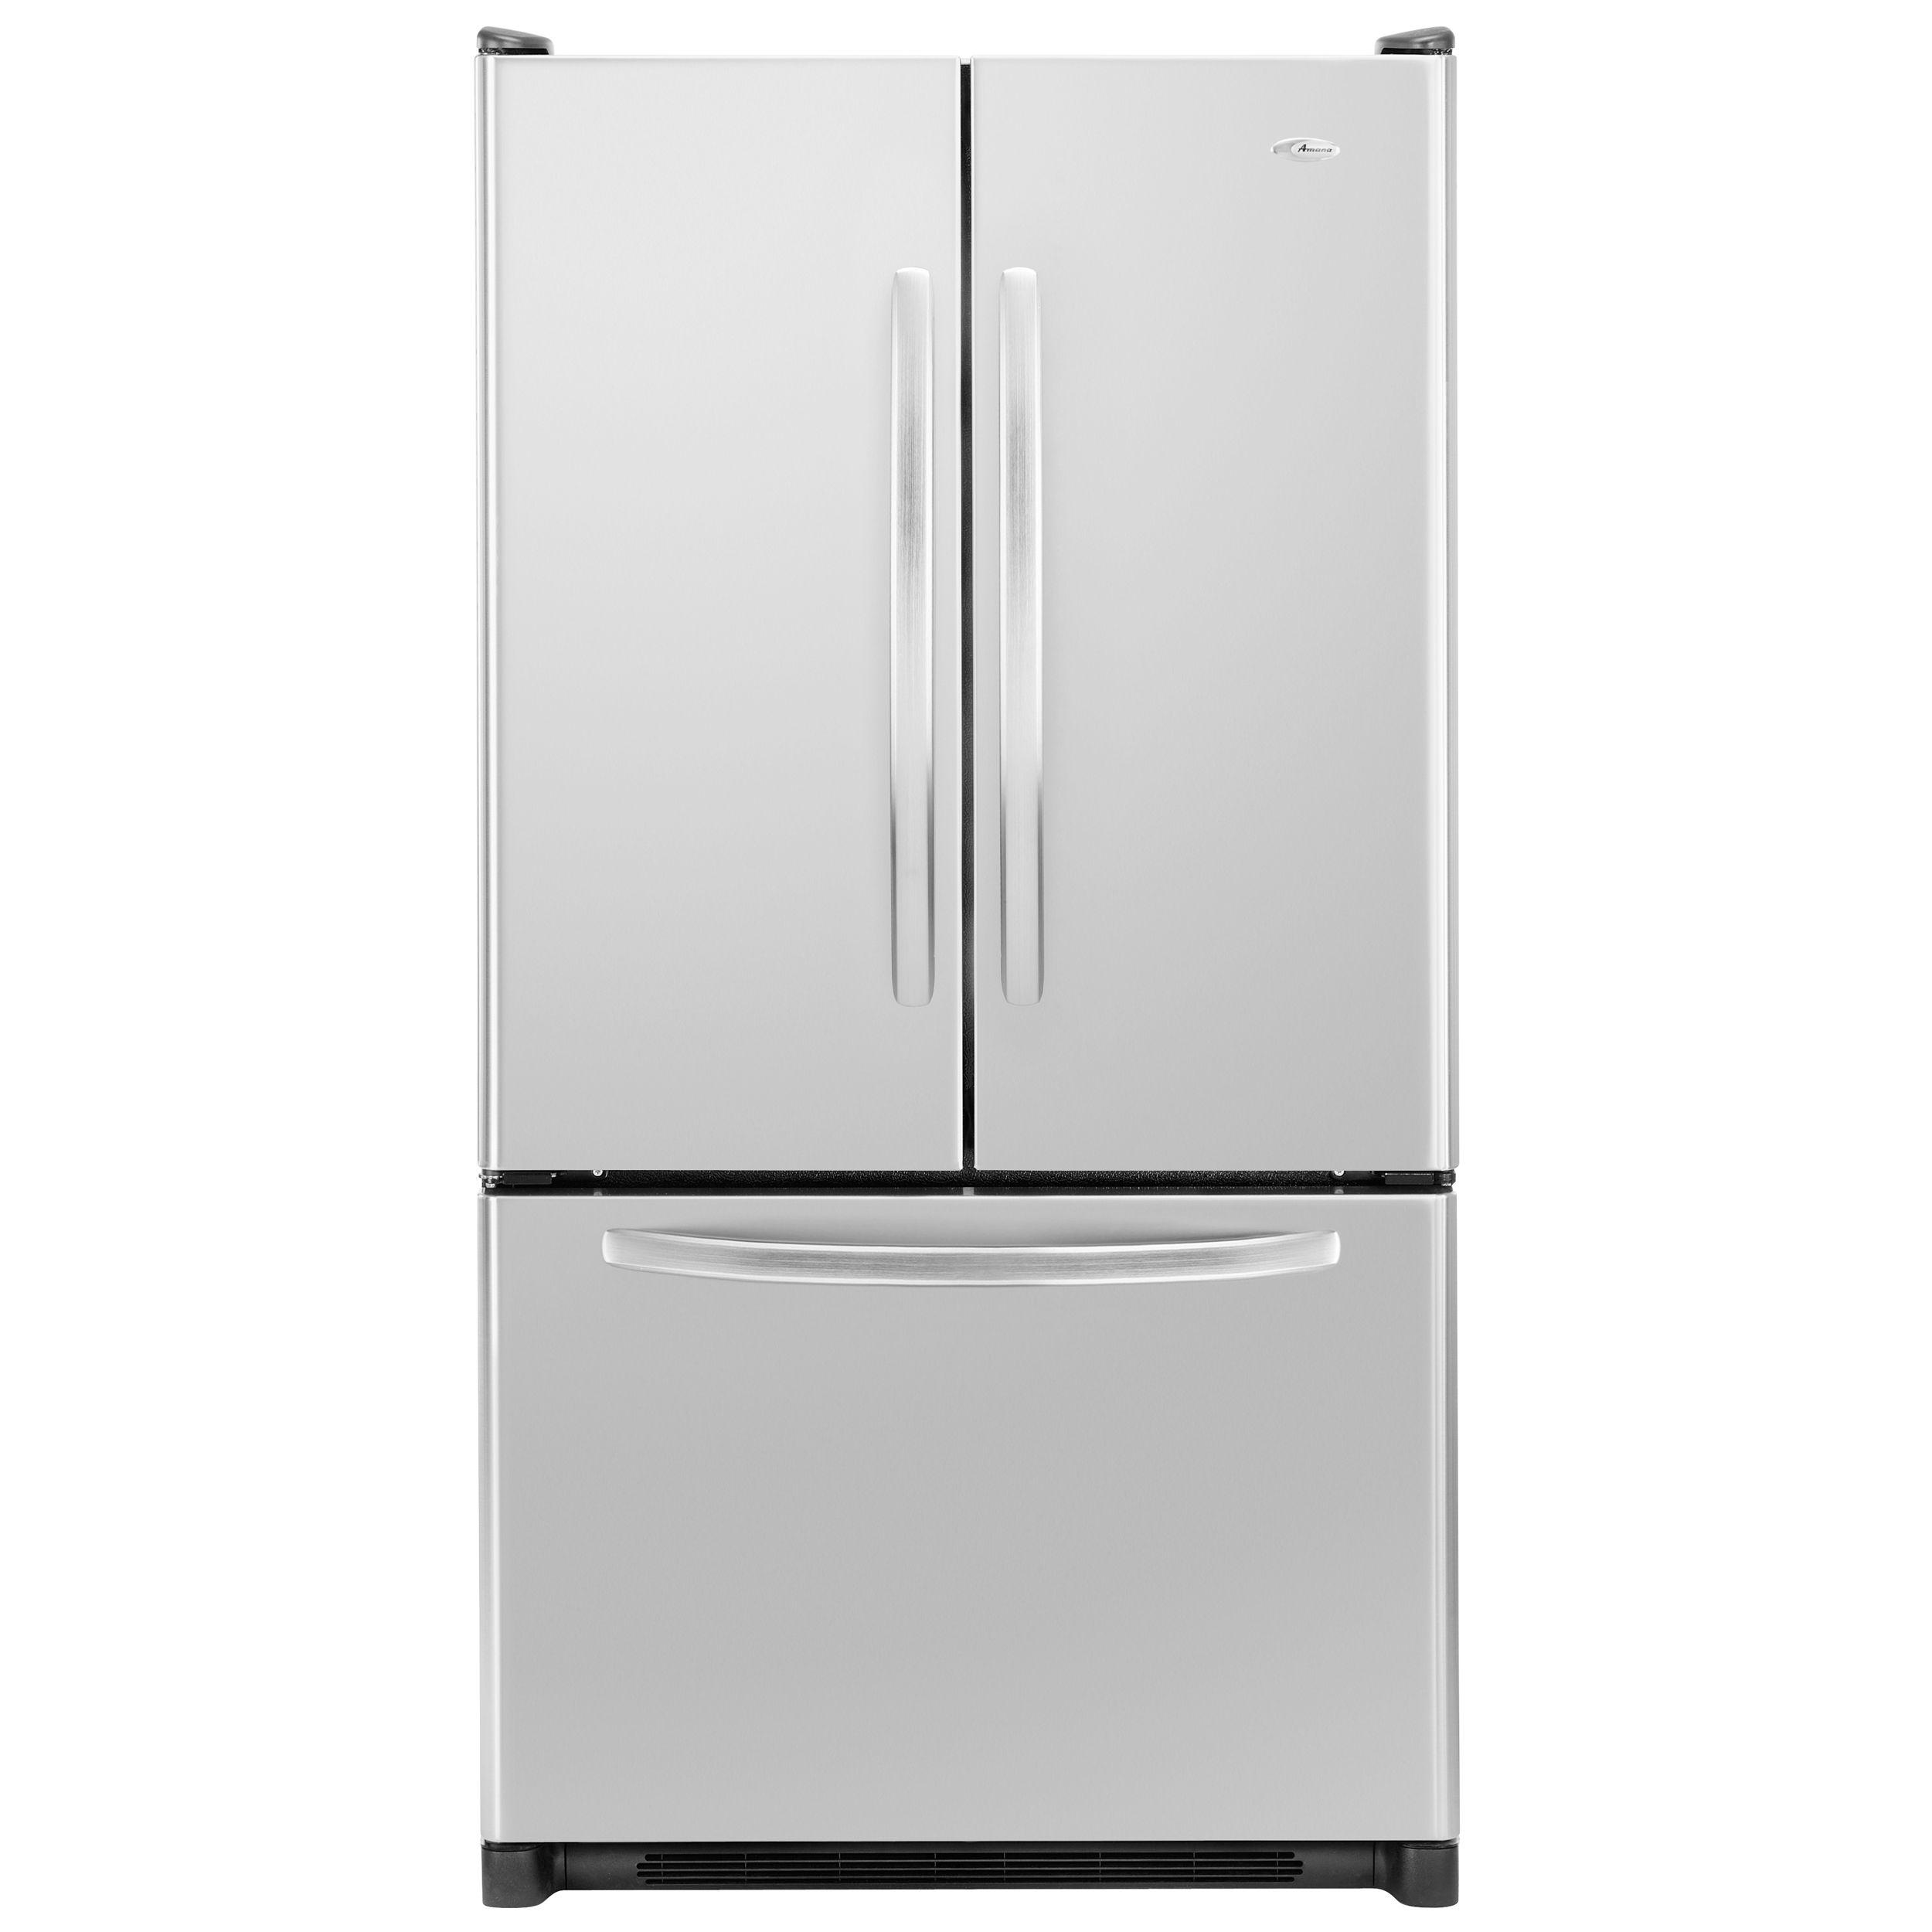 amana fridge wiring diagram 02 honda civic fuse box french door refrigerators sears autos post